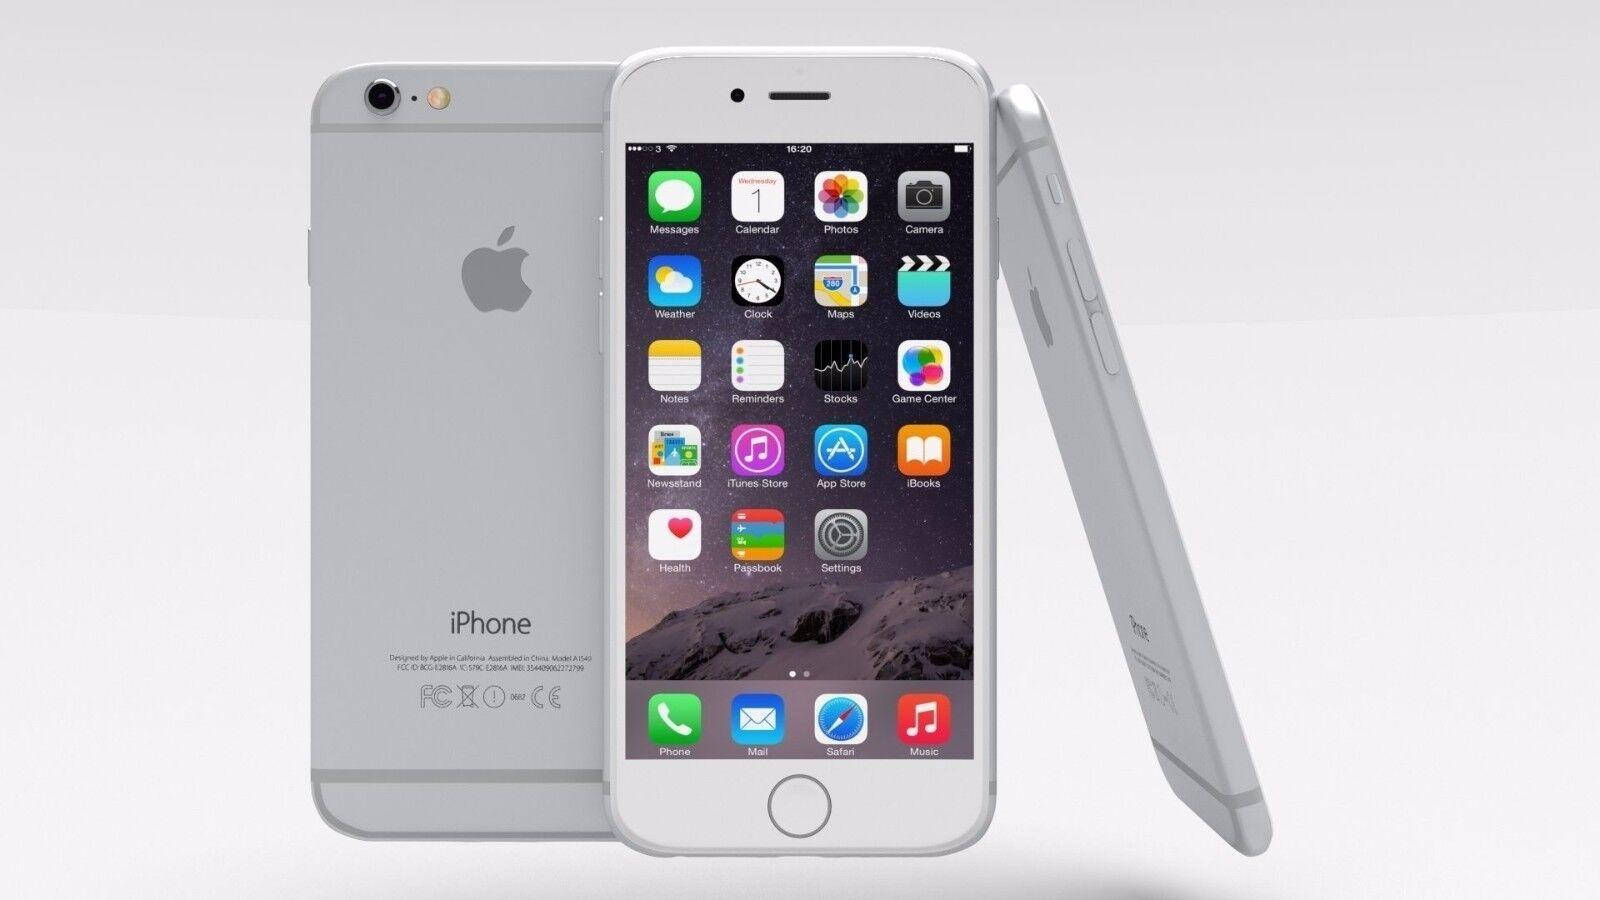 Apple iPhone 6 - 16GB 64GB 128GB (GSM Unlocked) Smartphone Gold Gray Silver